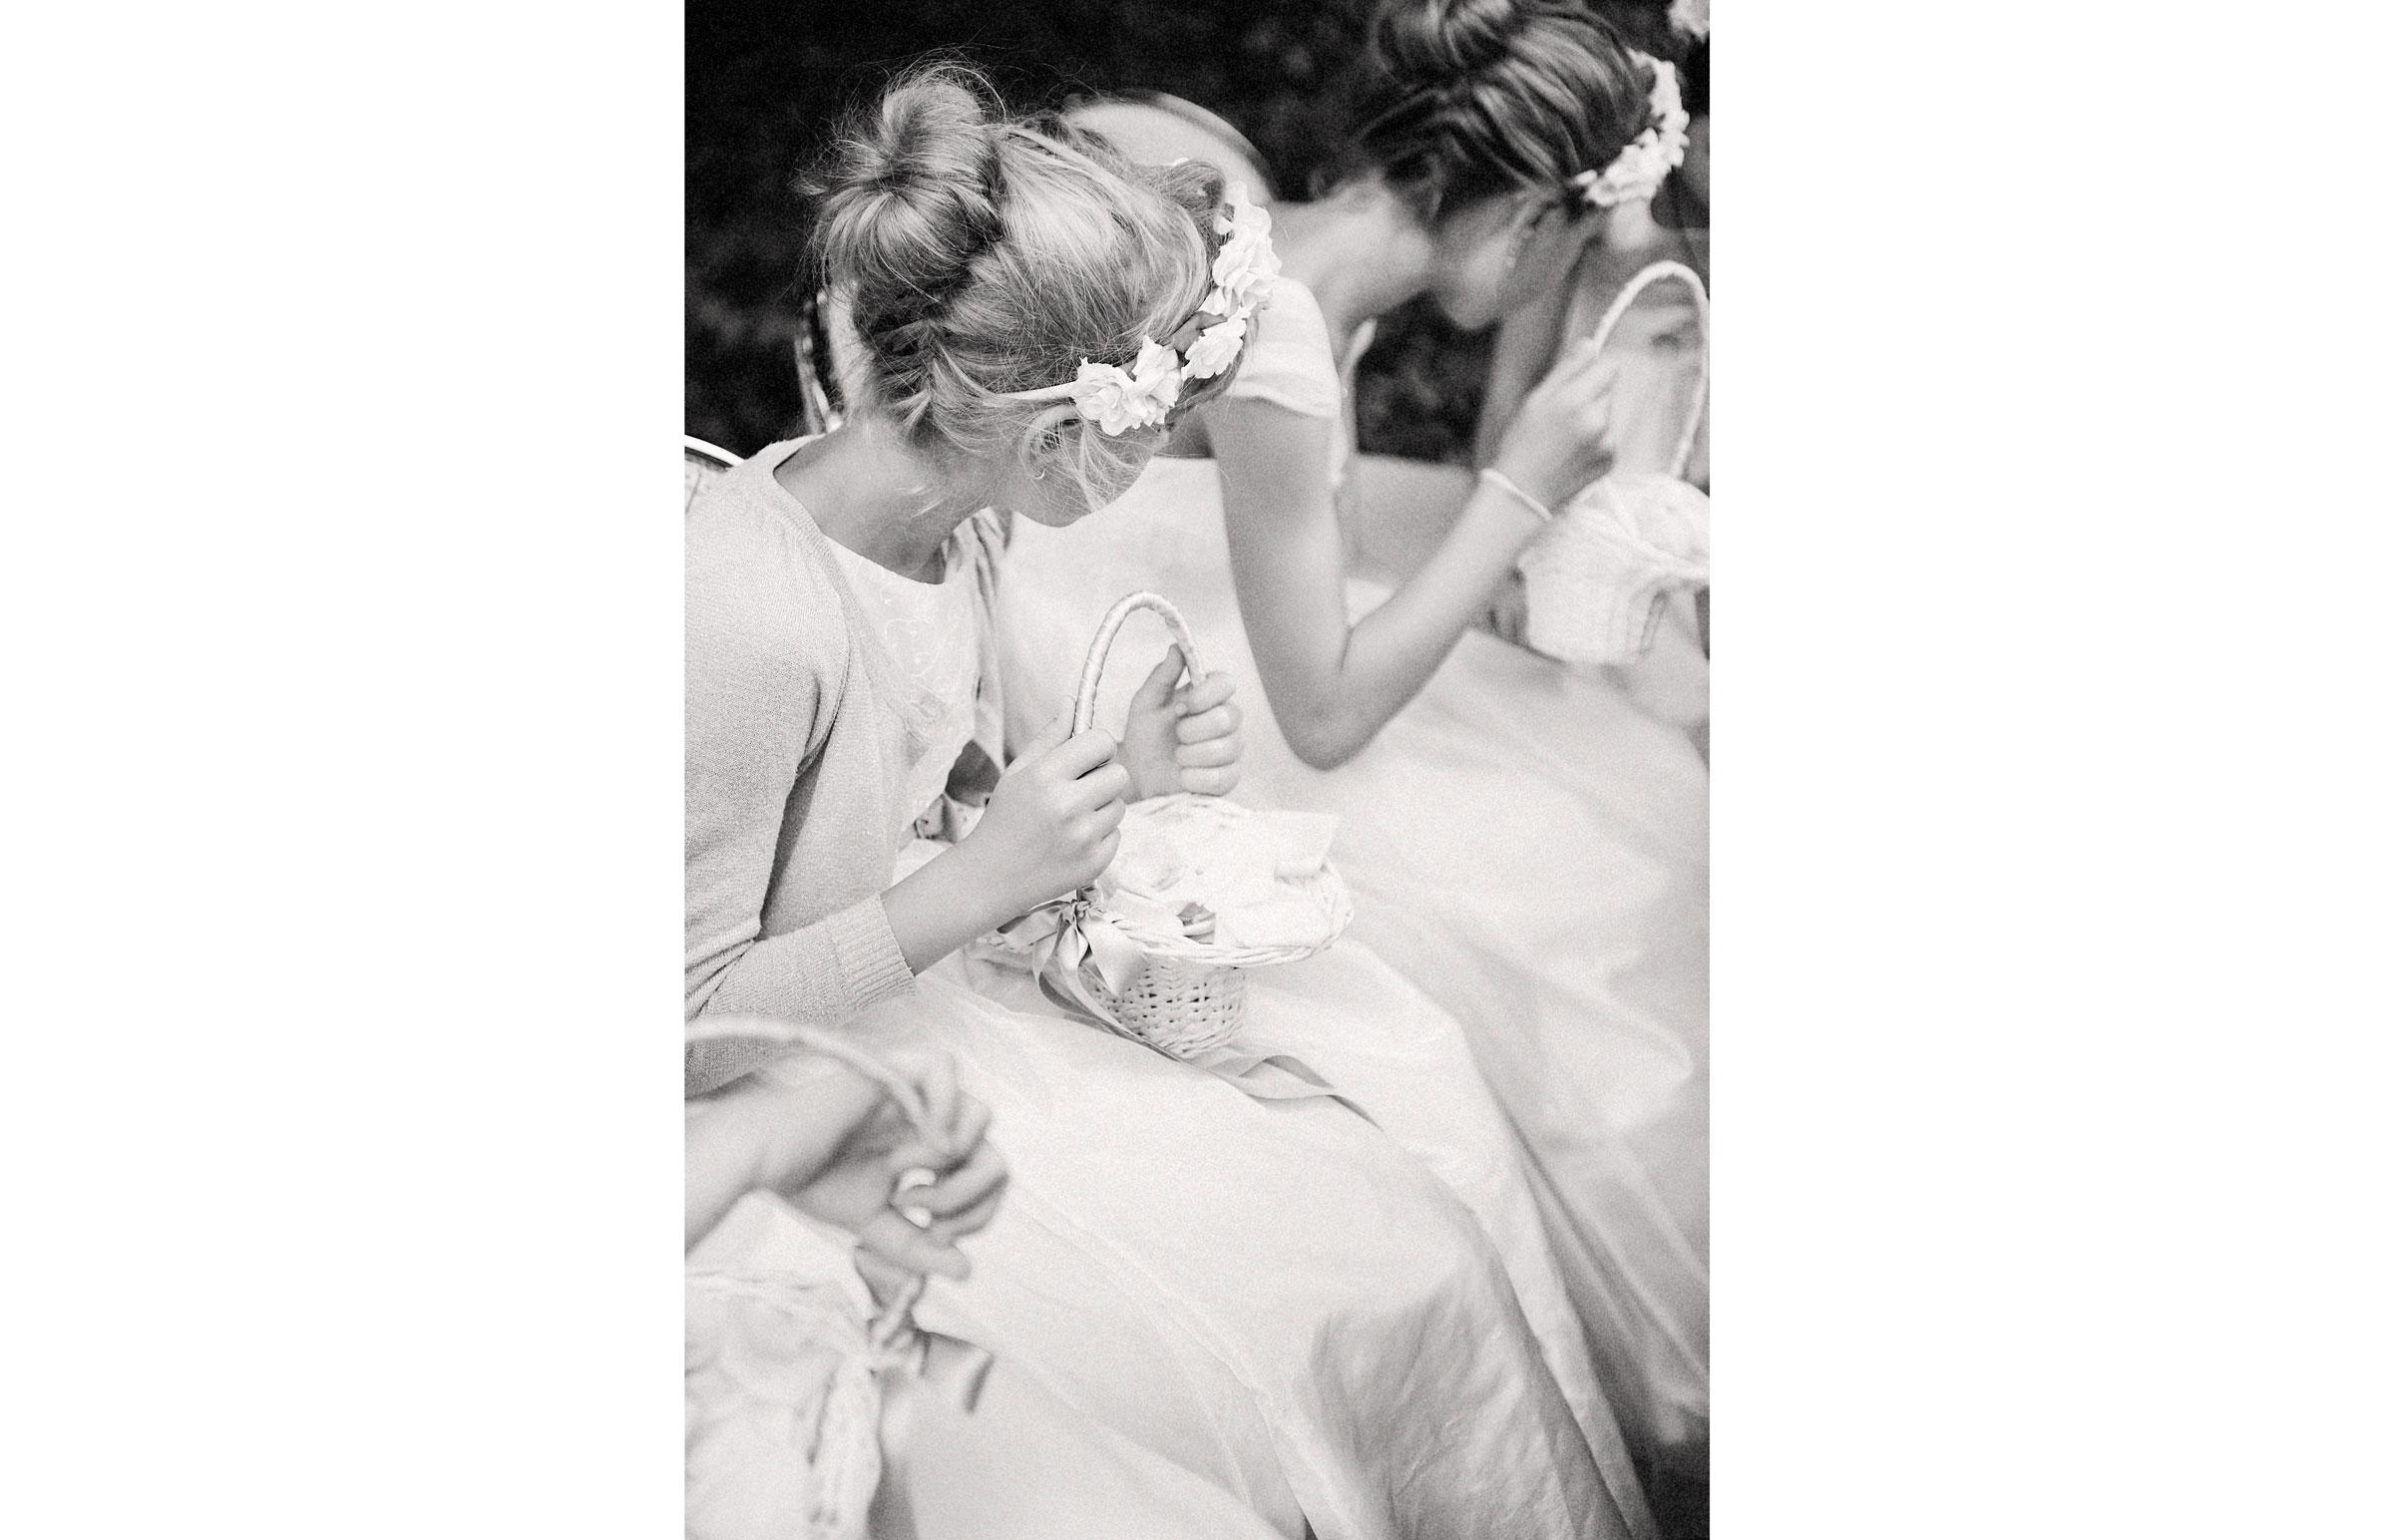 wedding-photographer-zuric6h.jpg